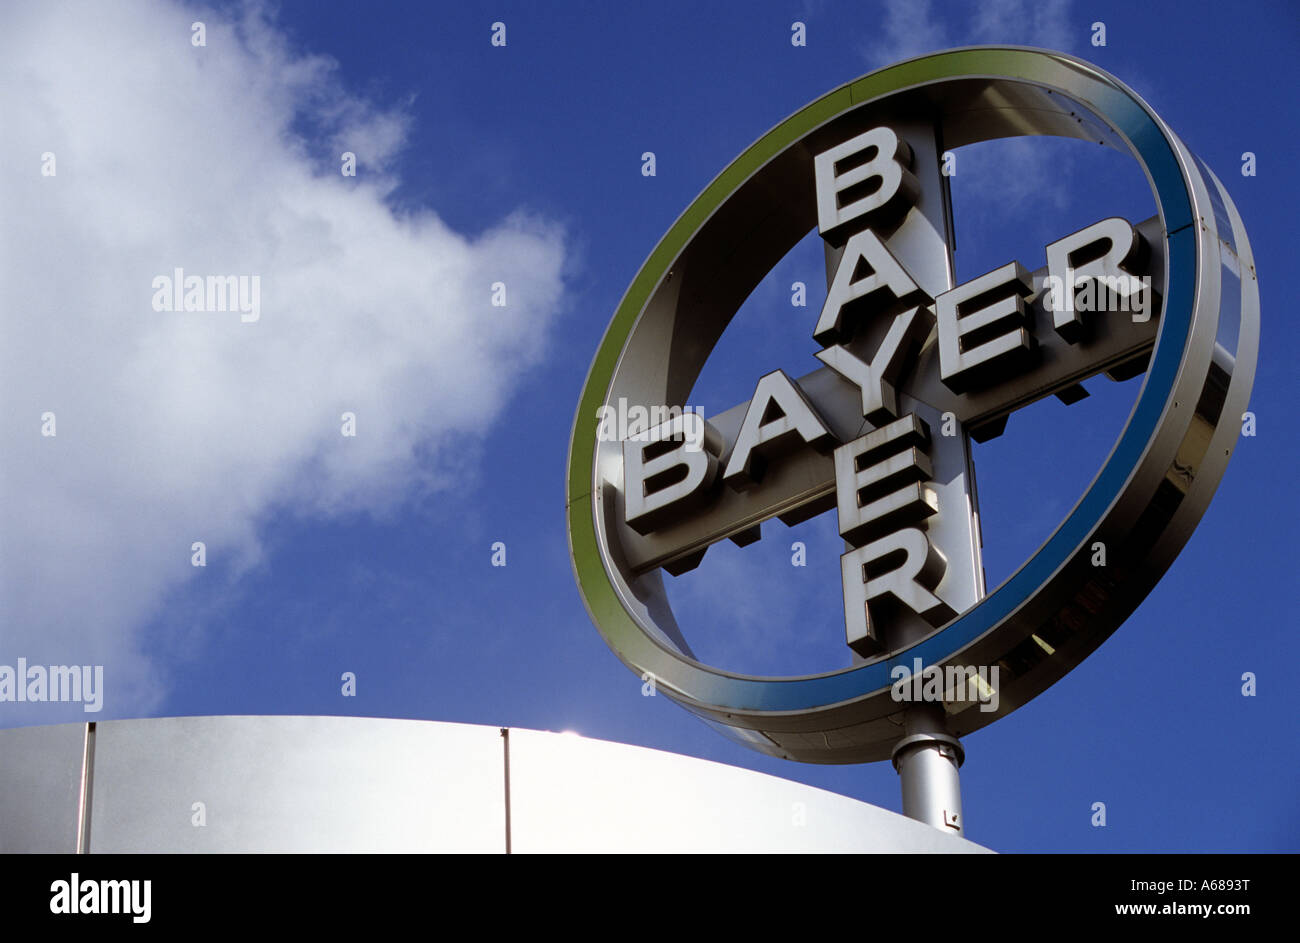 Bayer AG corporate logo in Leverkusen, North Rhine-Westphalia, Germany. - Stock Image